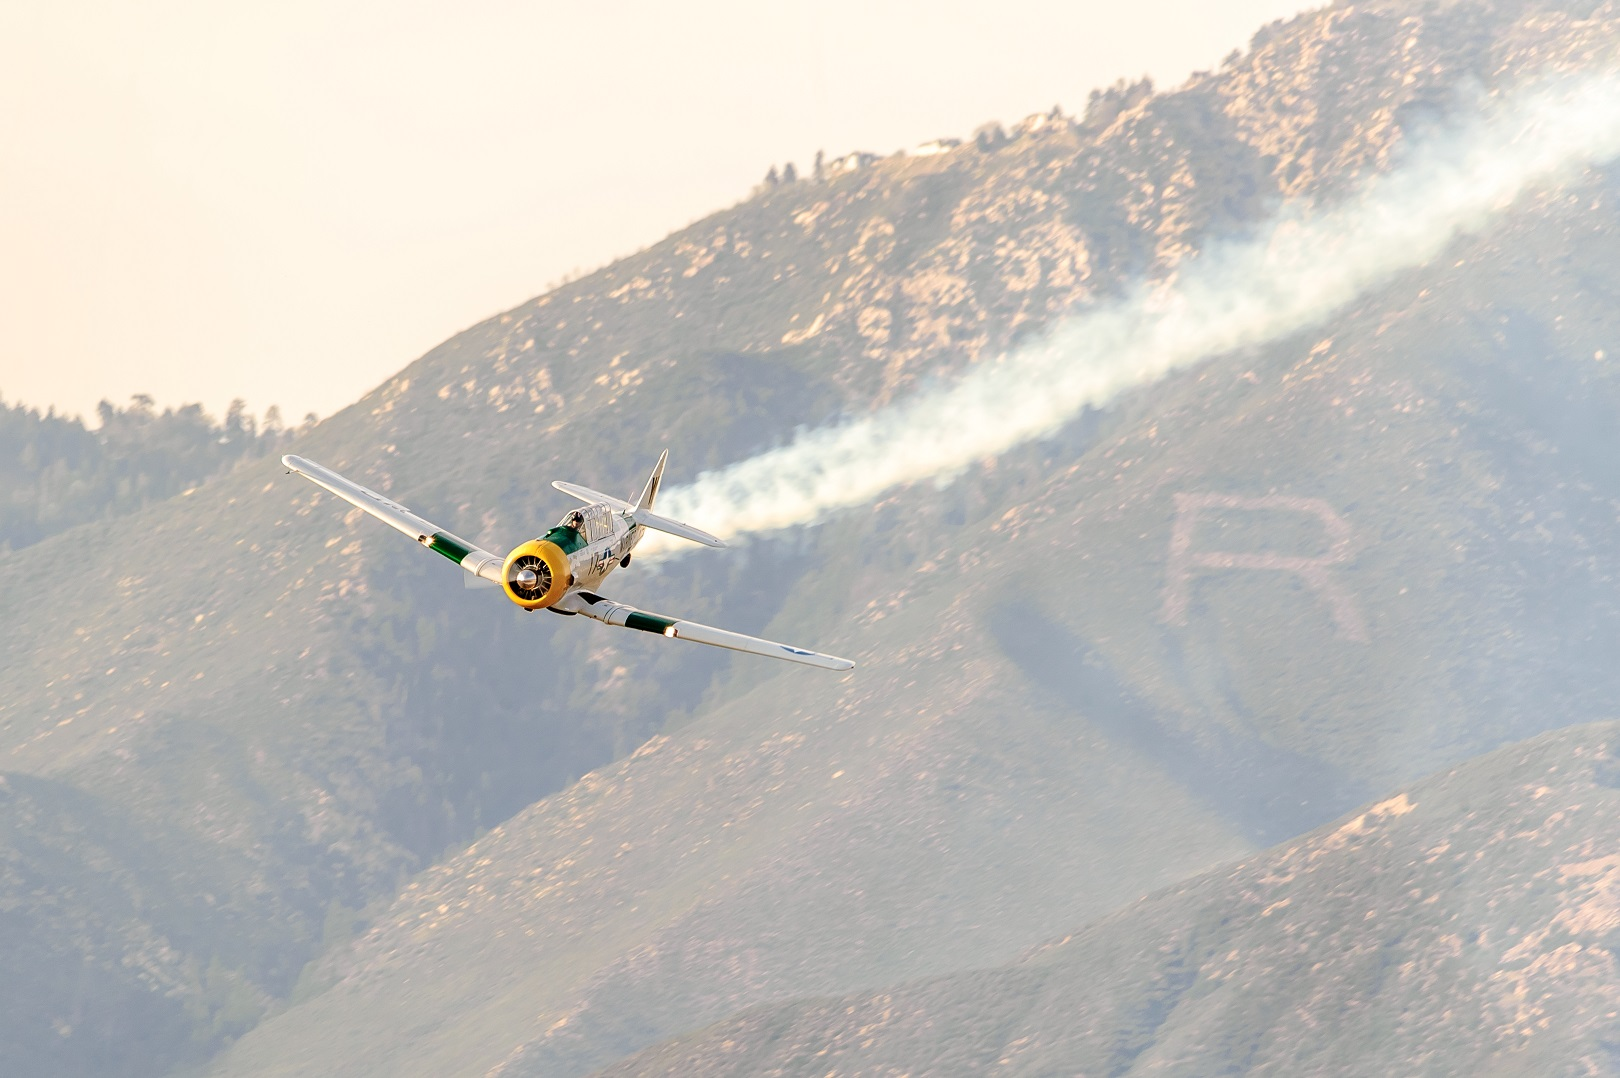 Hangar 24 Announces Details for 2015 AirFest | Brewbound.com